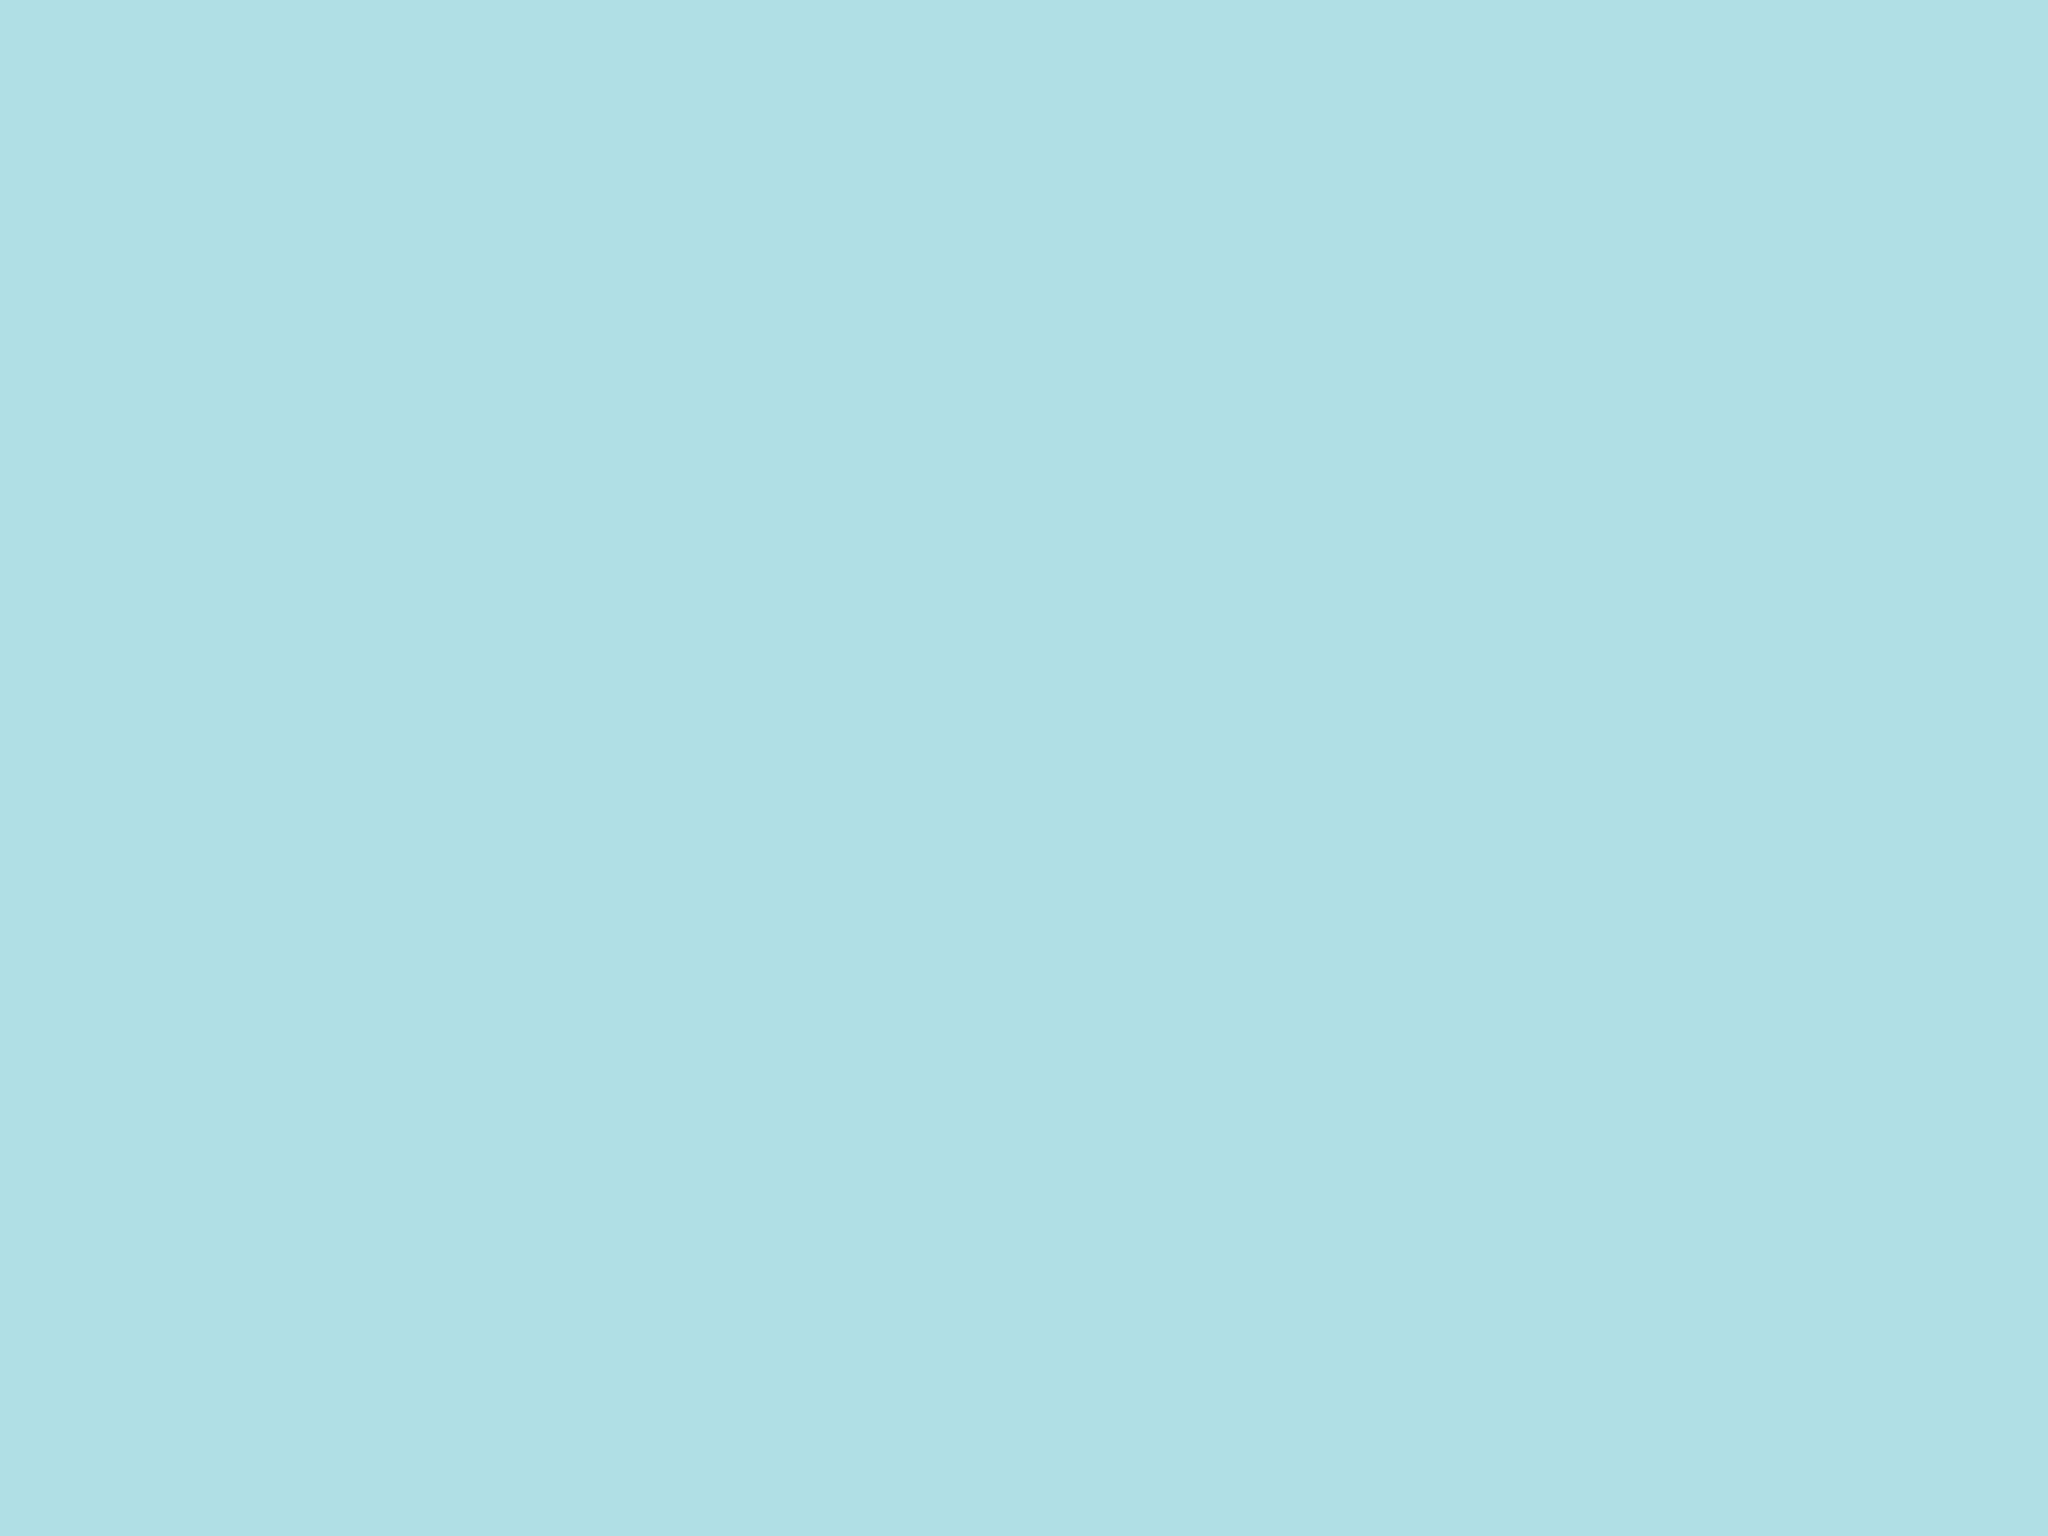 2048x1536 Powder Blue Web Solid Color Background